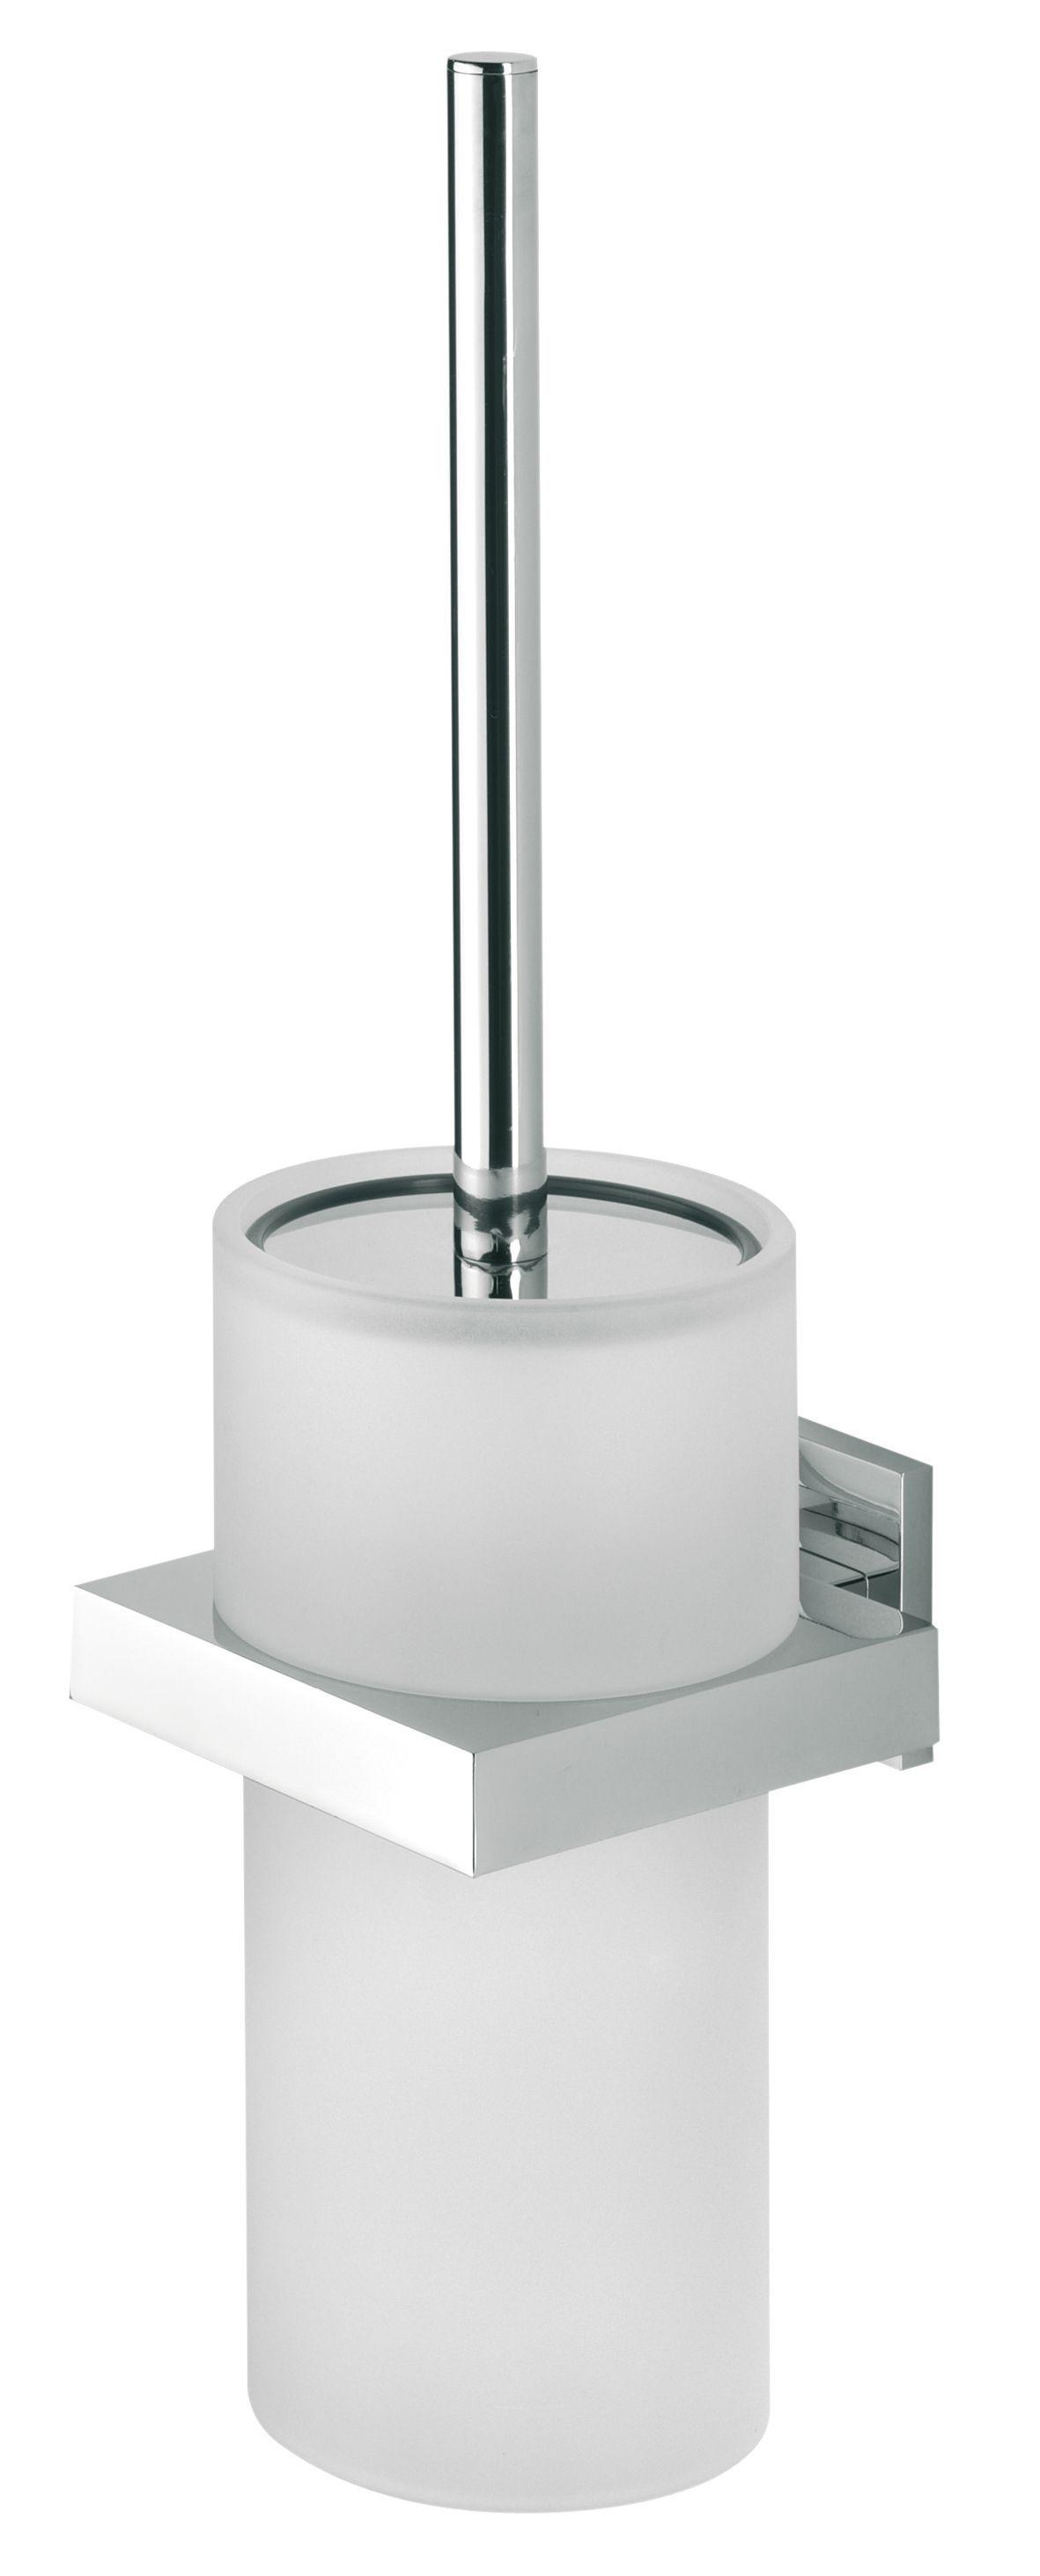 Tiger Items toiletborstelgarnituur RVS